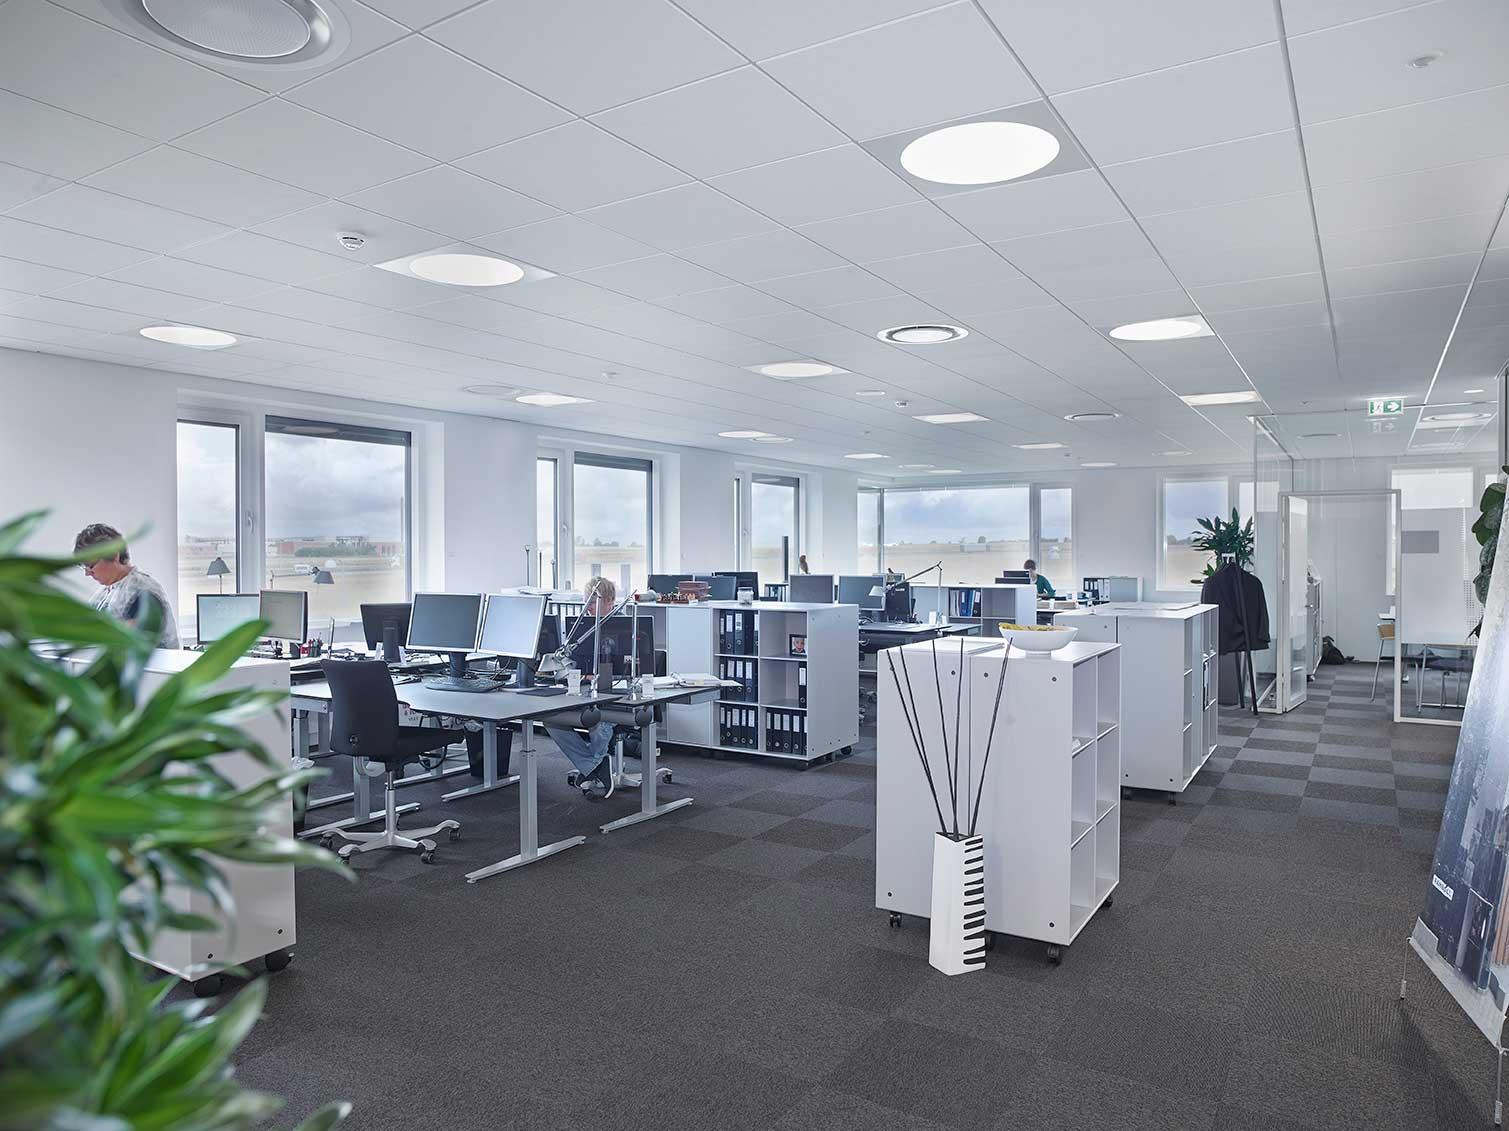 Ledgo Circle 595 LED panel lampe, indbygget i åbent kontorlandskab - Luminex